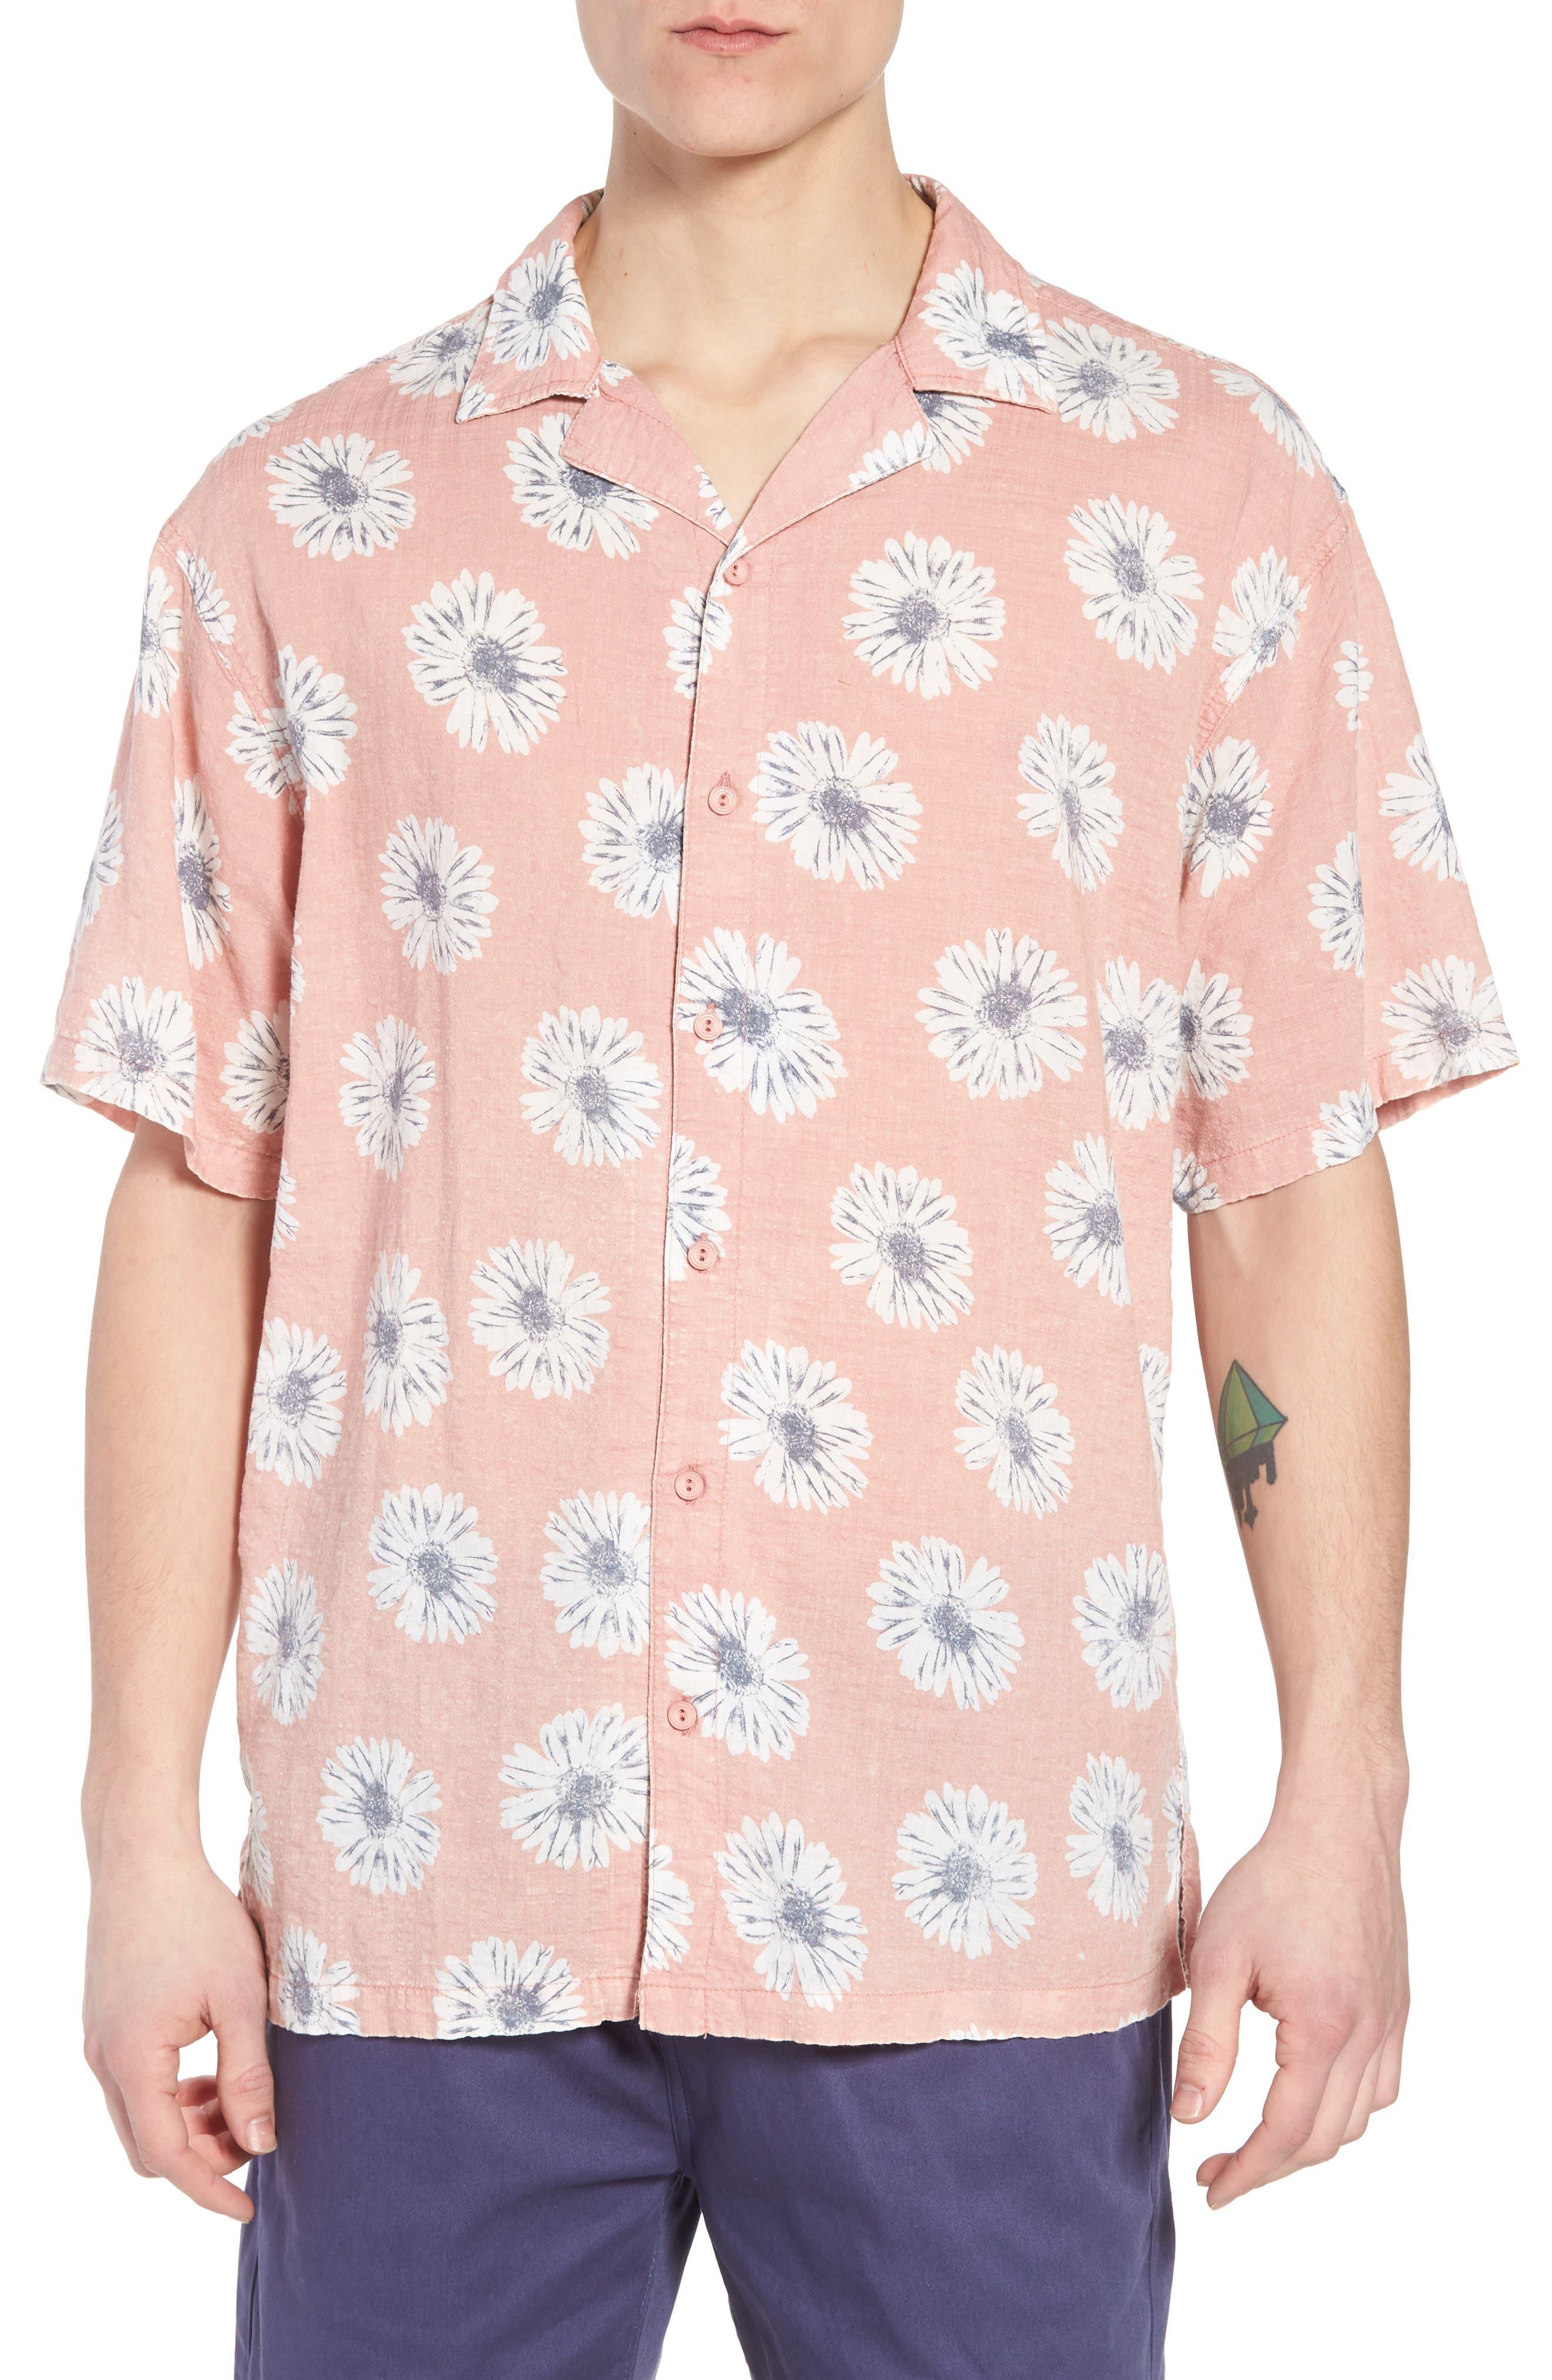 Ferris Woven Shirt,                         Main,                         color, Pink